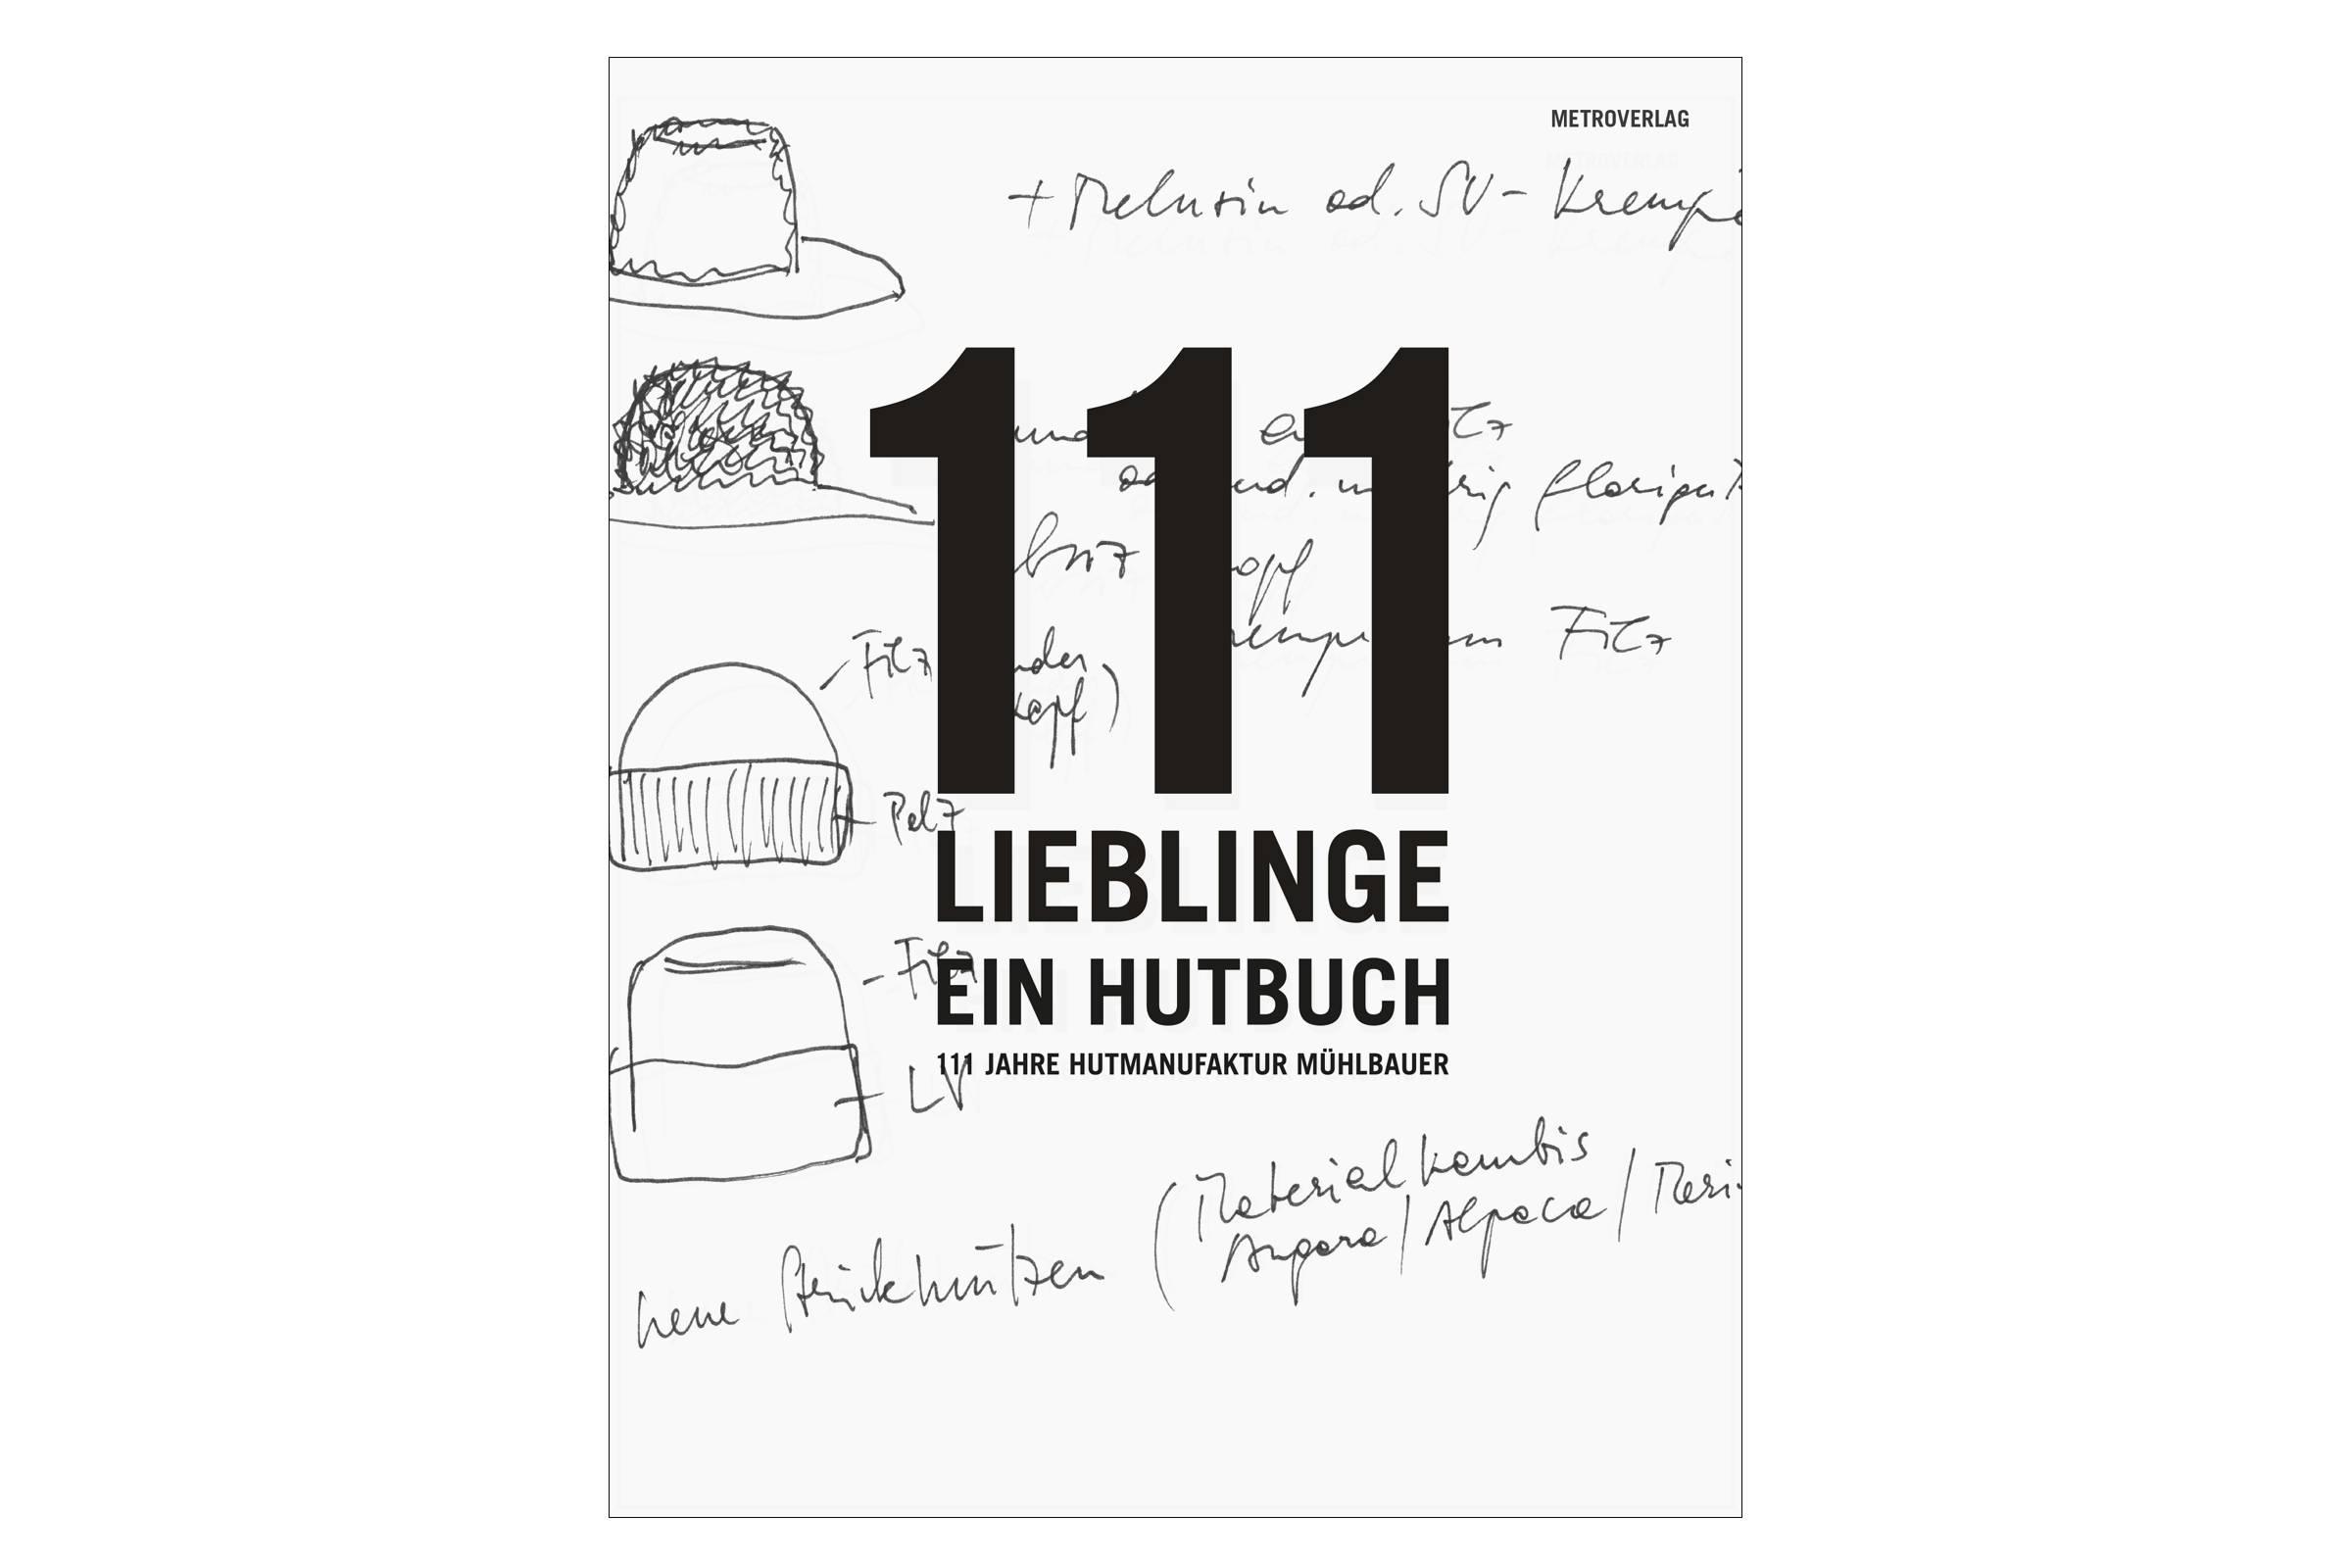 111 Lieblinge - Ein Hutbuch 111 LIEBLINGE - EIN HUTBUCH Buch